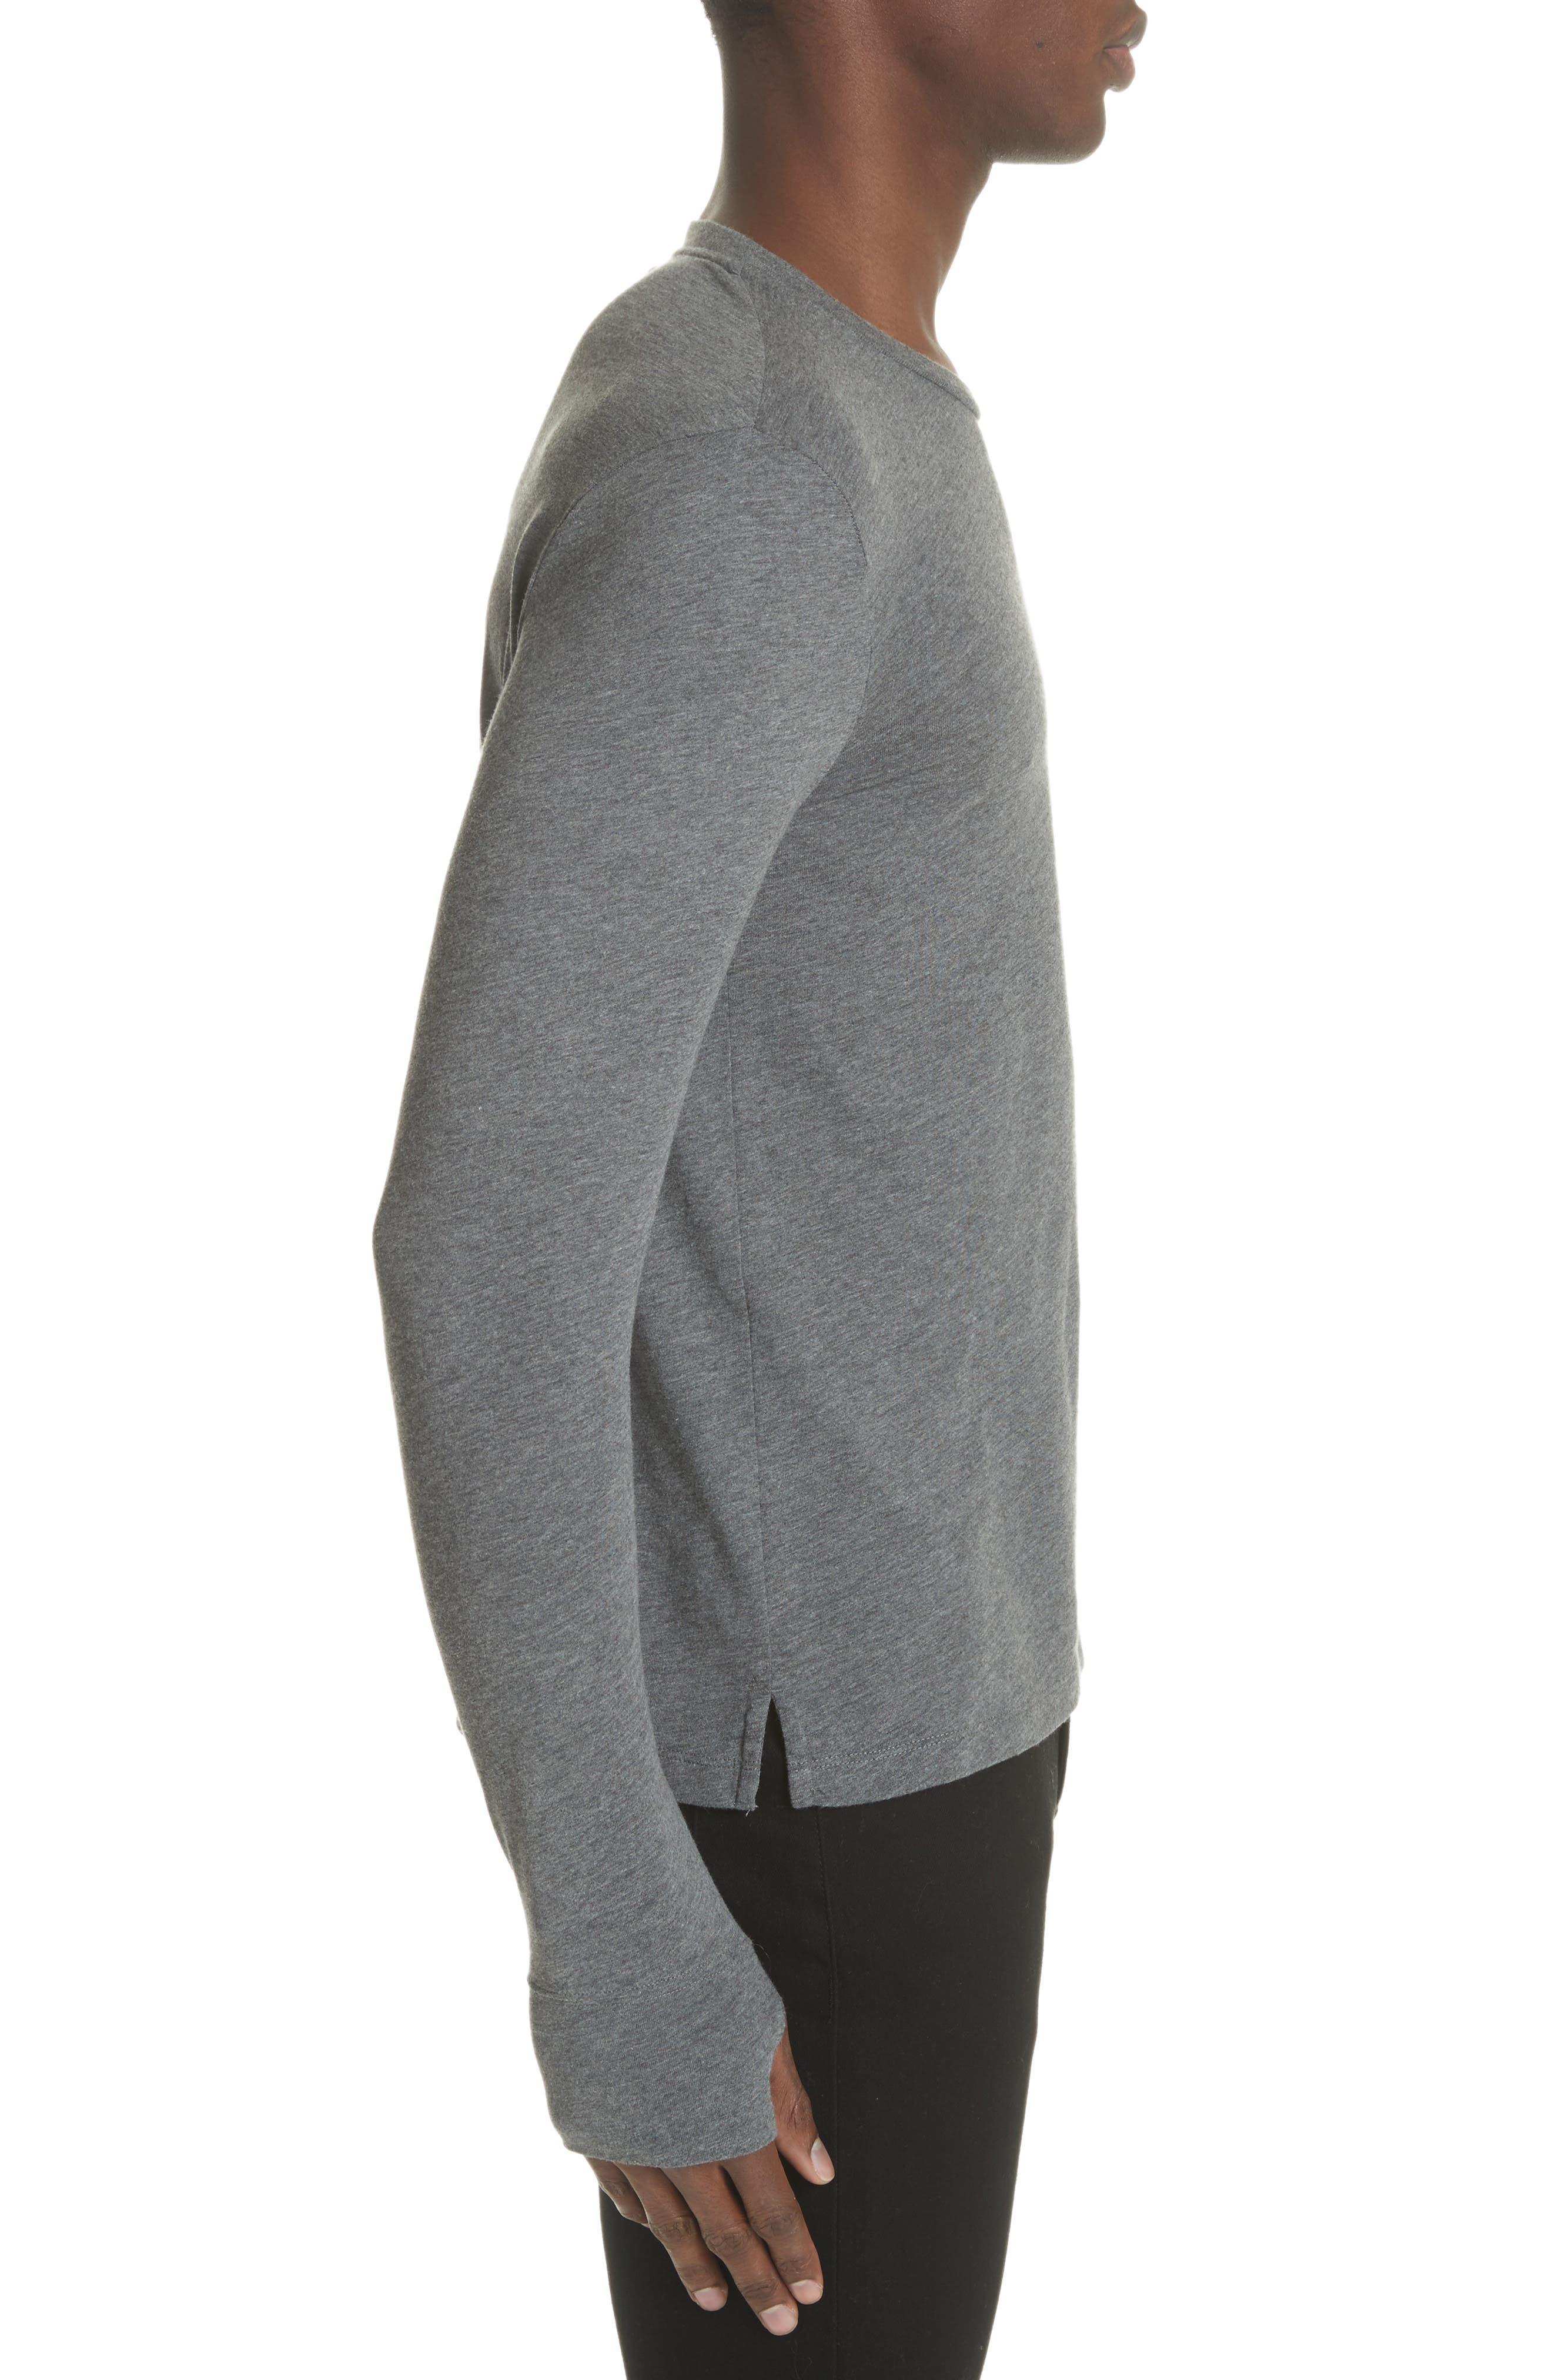 Marchston Regular Fit Crewneck Shirt,                             Alternate thumbnail 3, color,                             Mid Grey Melange